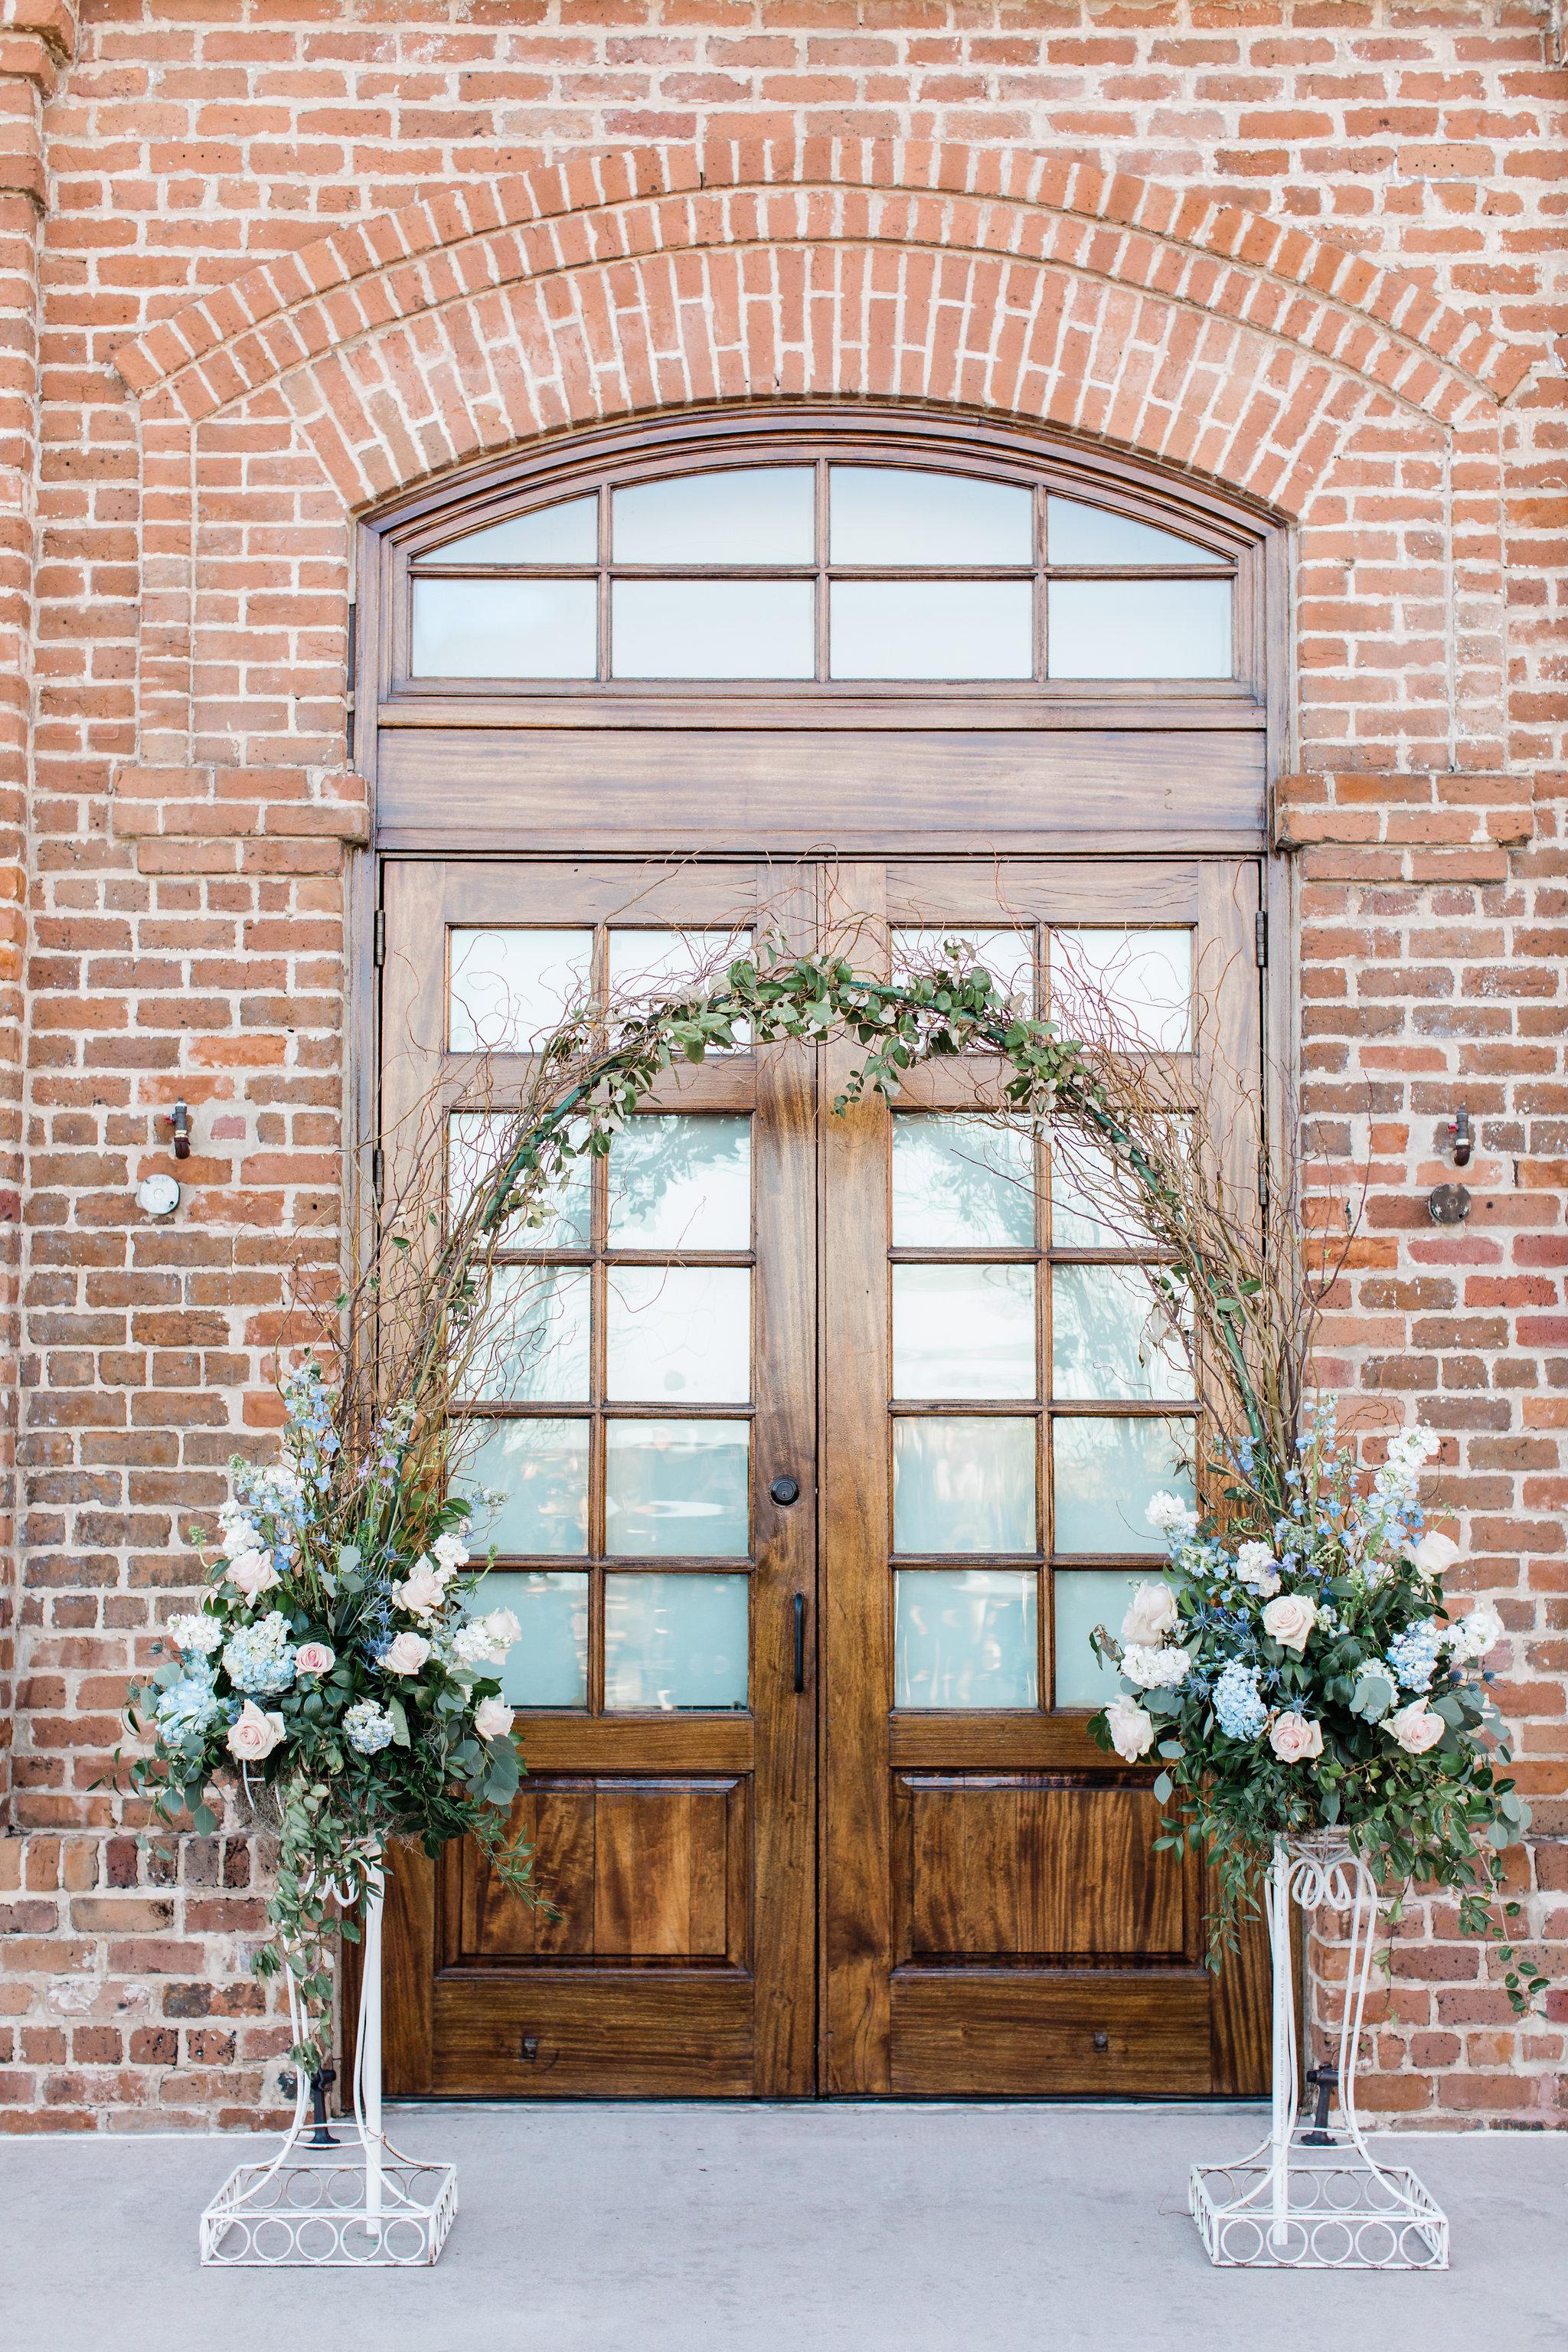 apt-b-photography-Savannah-wedding-photographer-savannah-engagement-photographer-historic-savannah-engagement-charles-h-morris-center-wedding-savannah-weddings-34.JPG